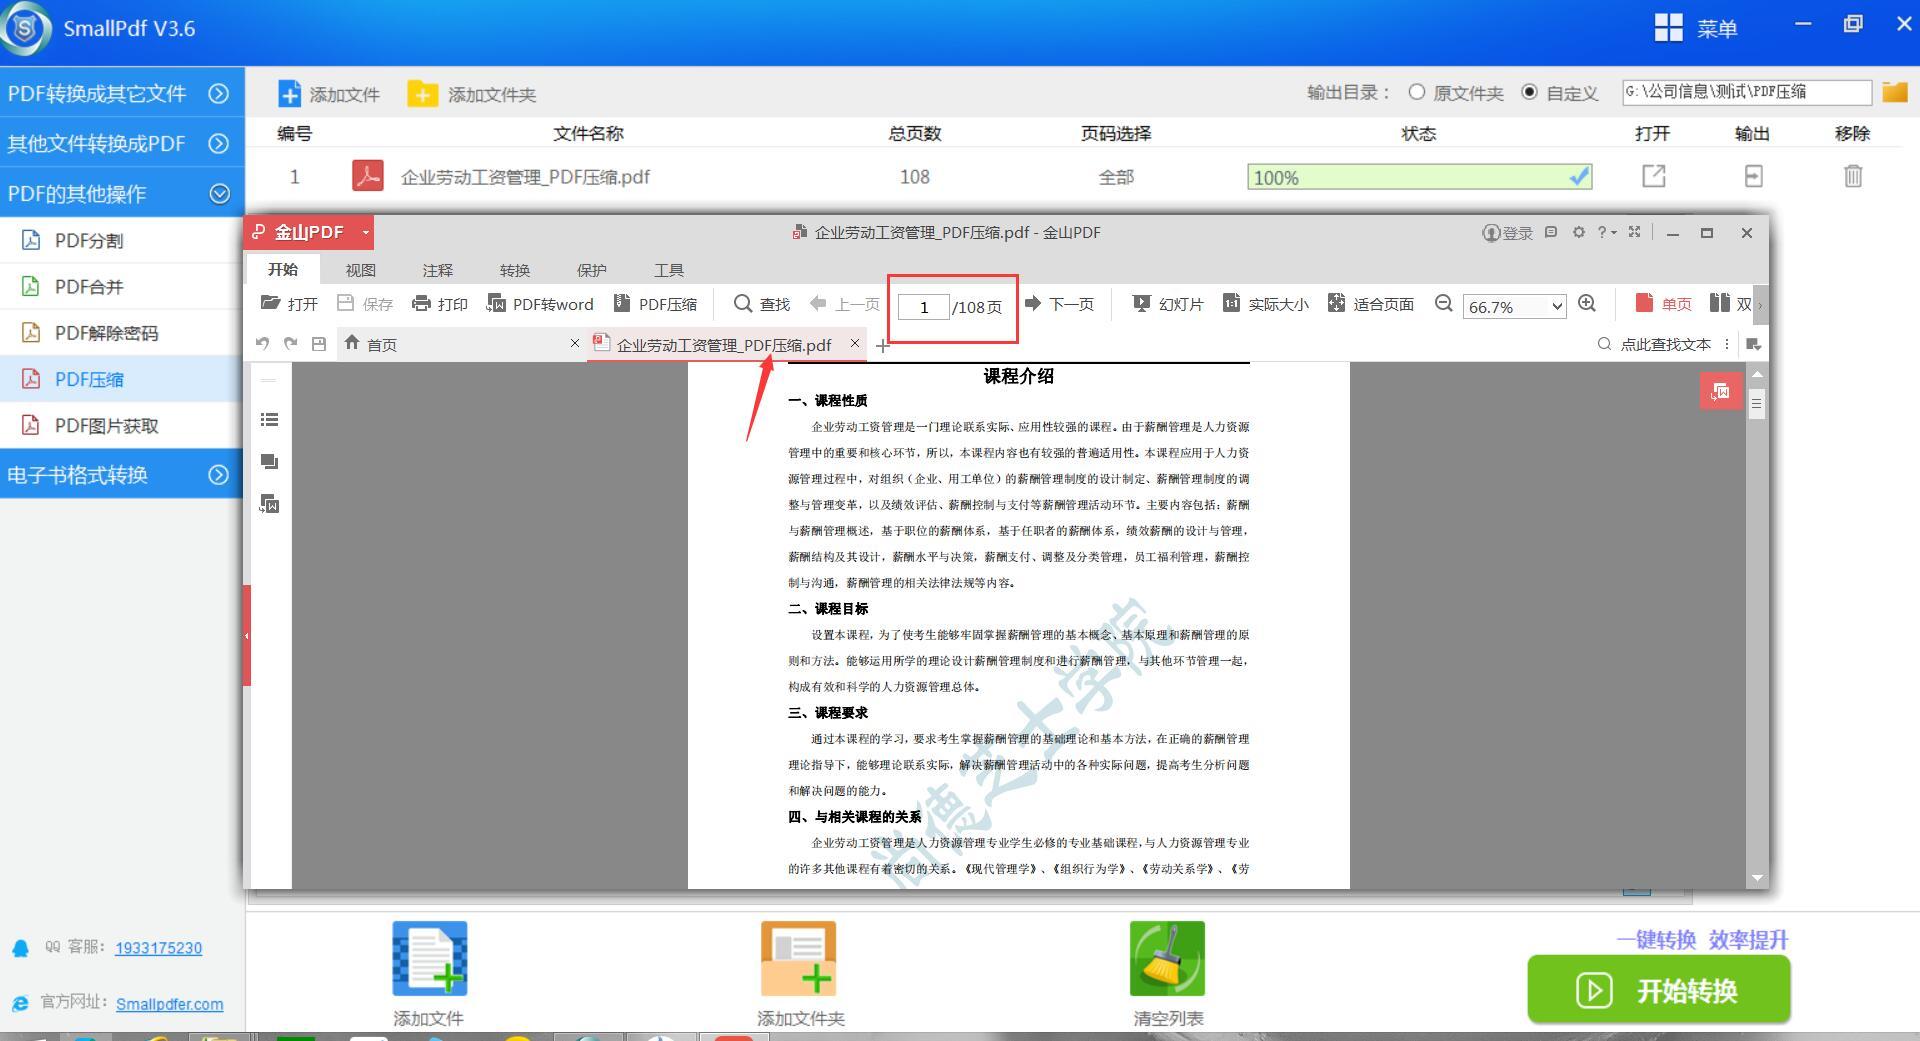 Small PDF转换成JPG软件PDF压缩操作-8